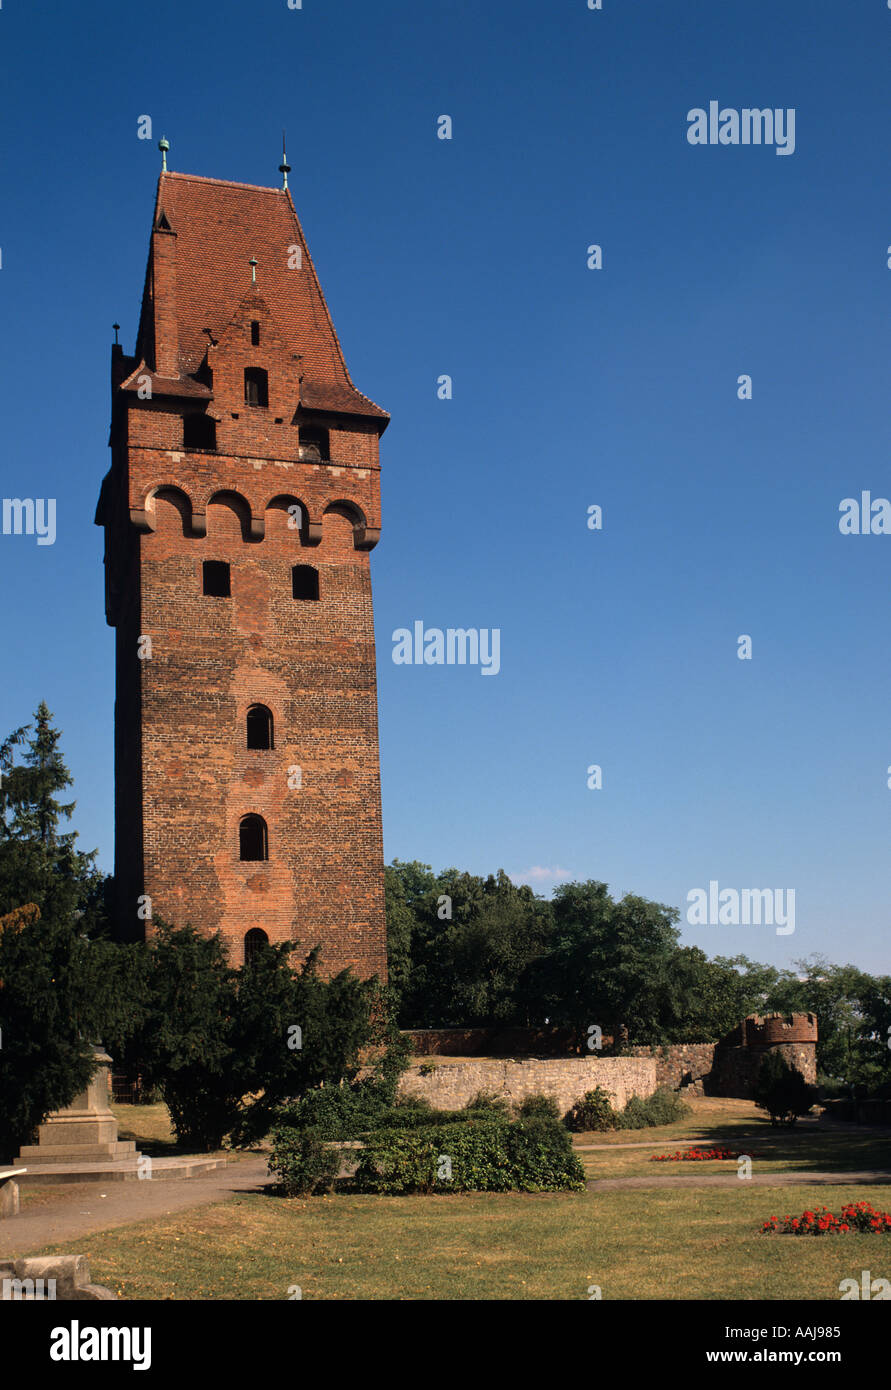 Europa Europe Deutschland Germany Tangermuende Sachsen Anhalt Kapitelturm Kapitel Turn Tower Saxony Anhalt Stock Photo